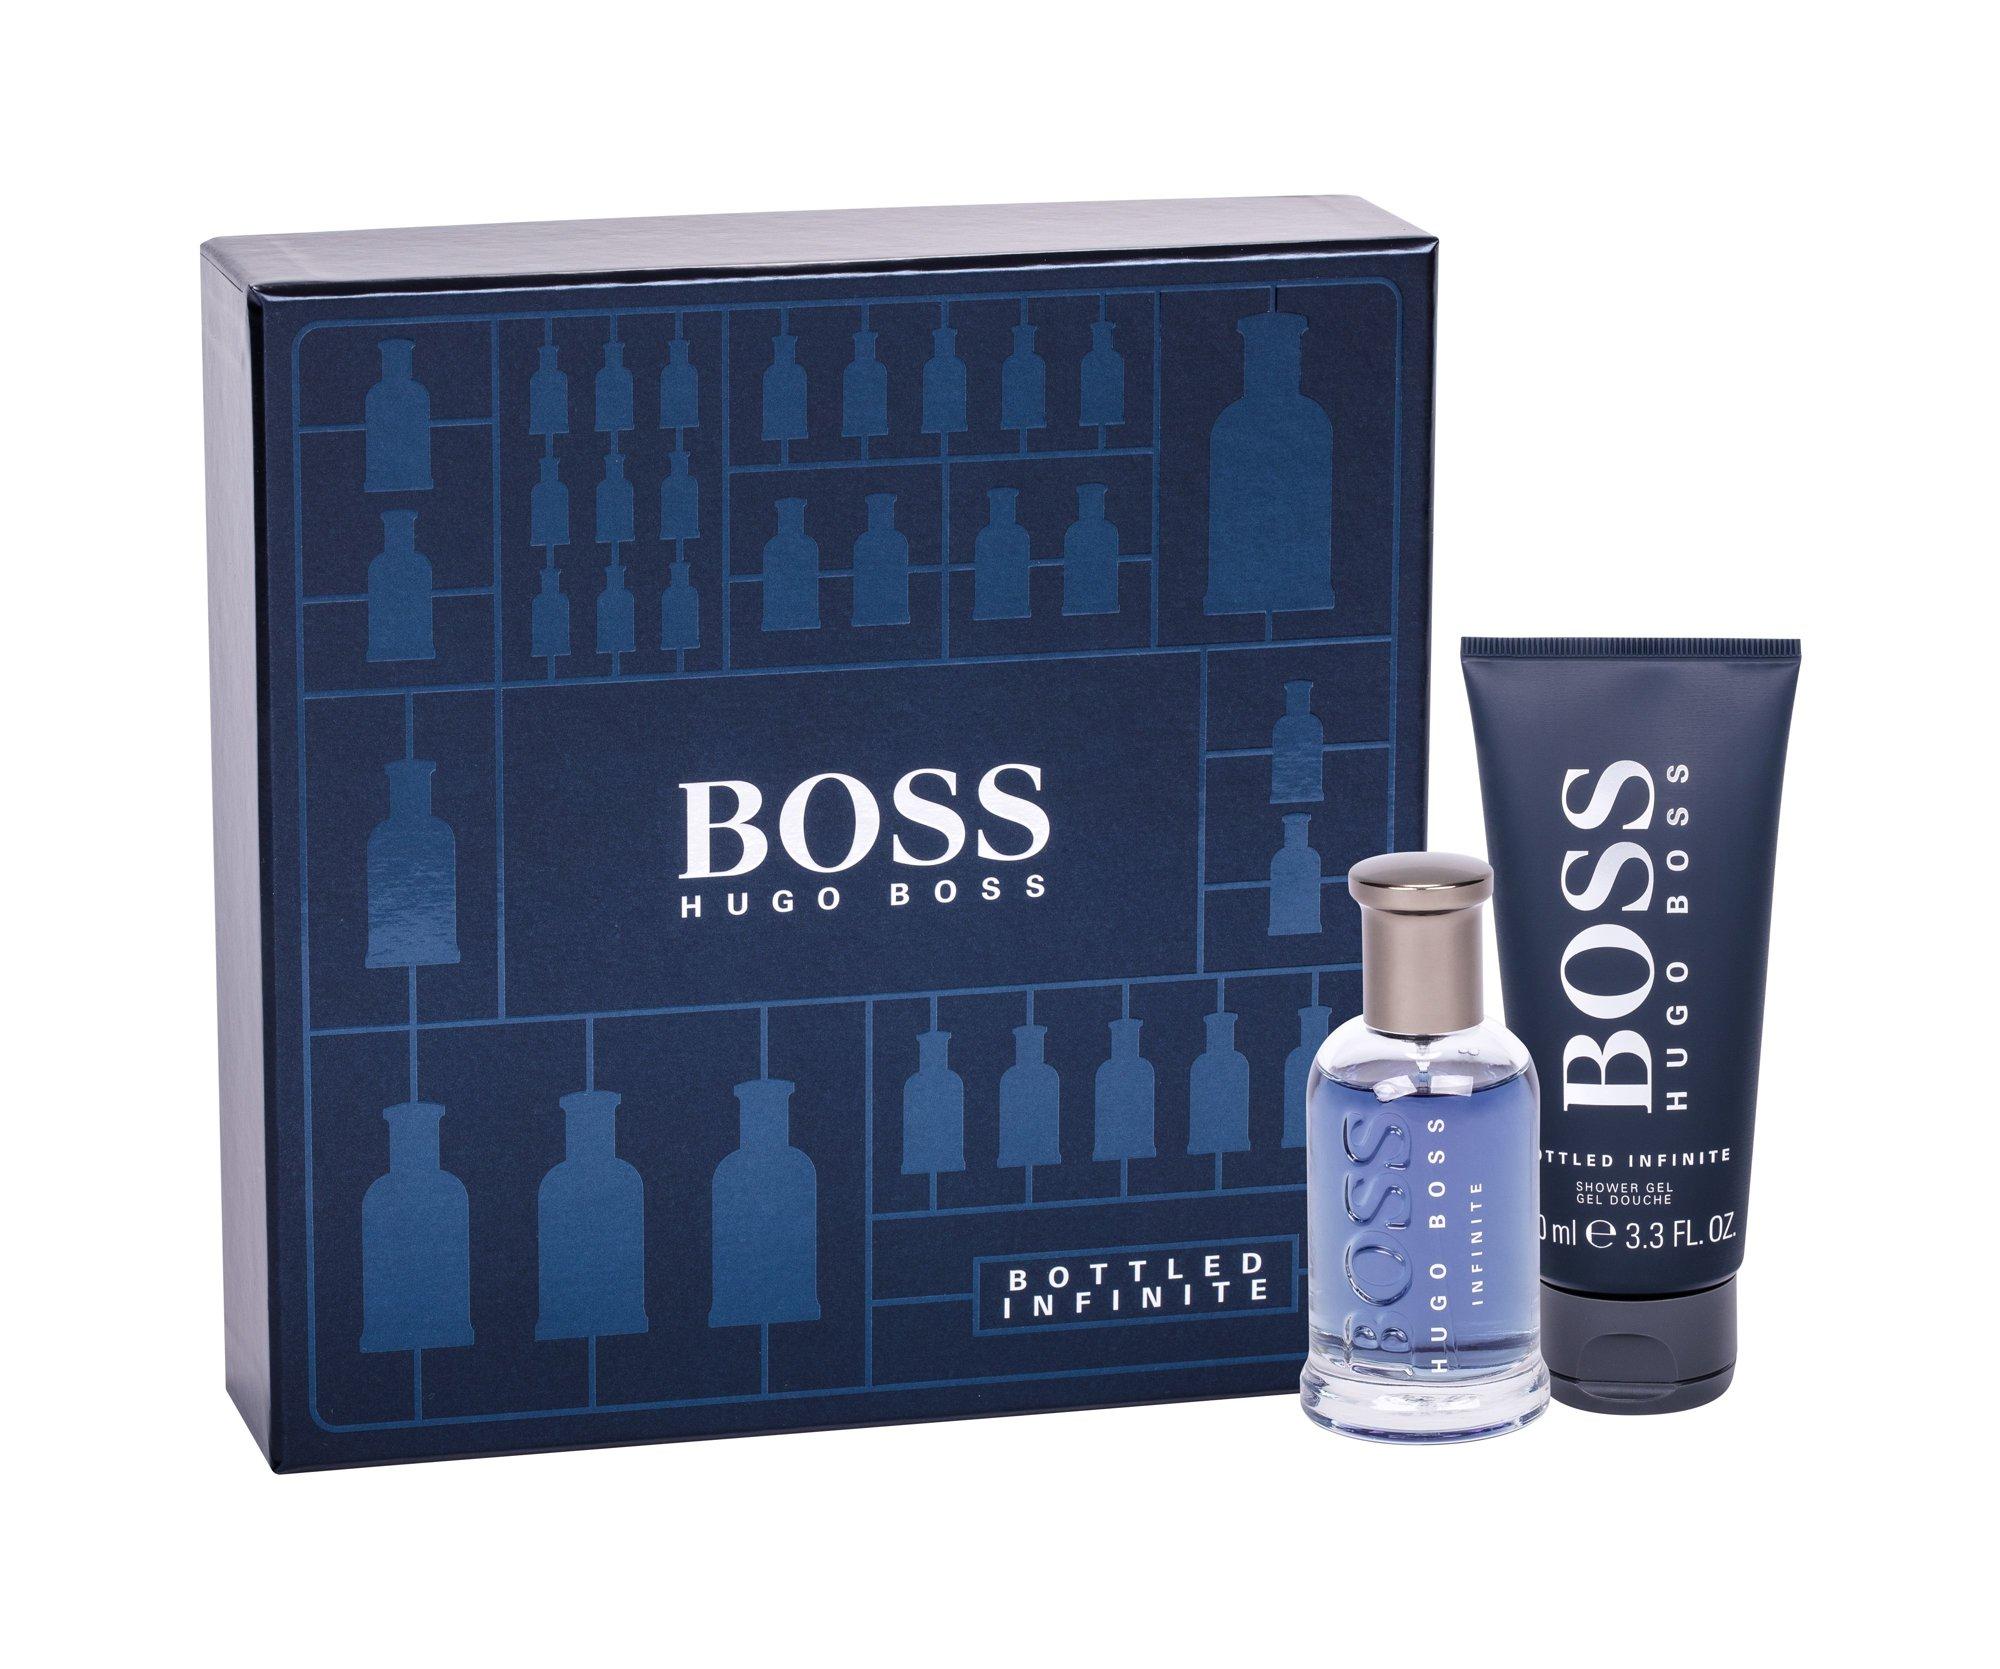 HUGO BOSS Boss Bottled Infinite, parfumovaná voda 50 ml + sprchovací gél 100 ml